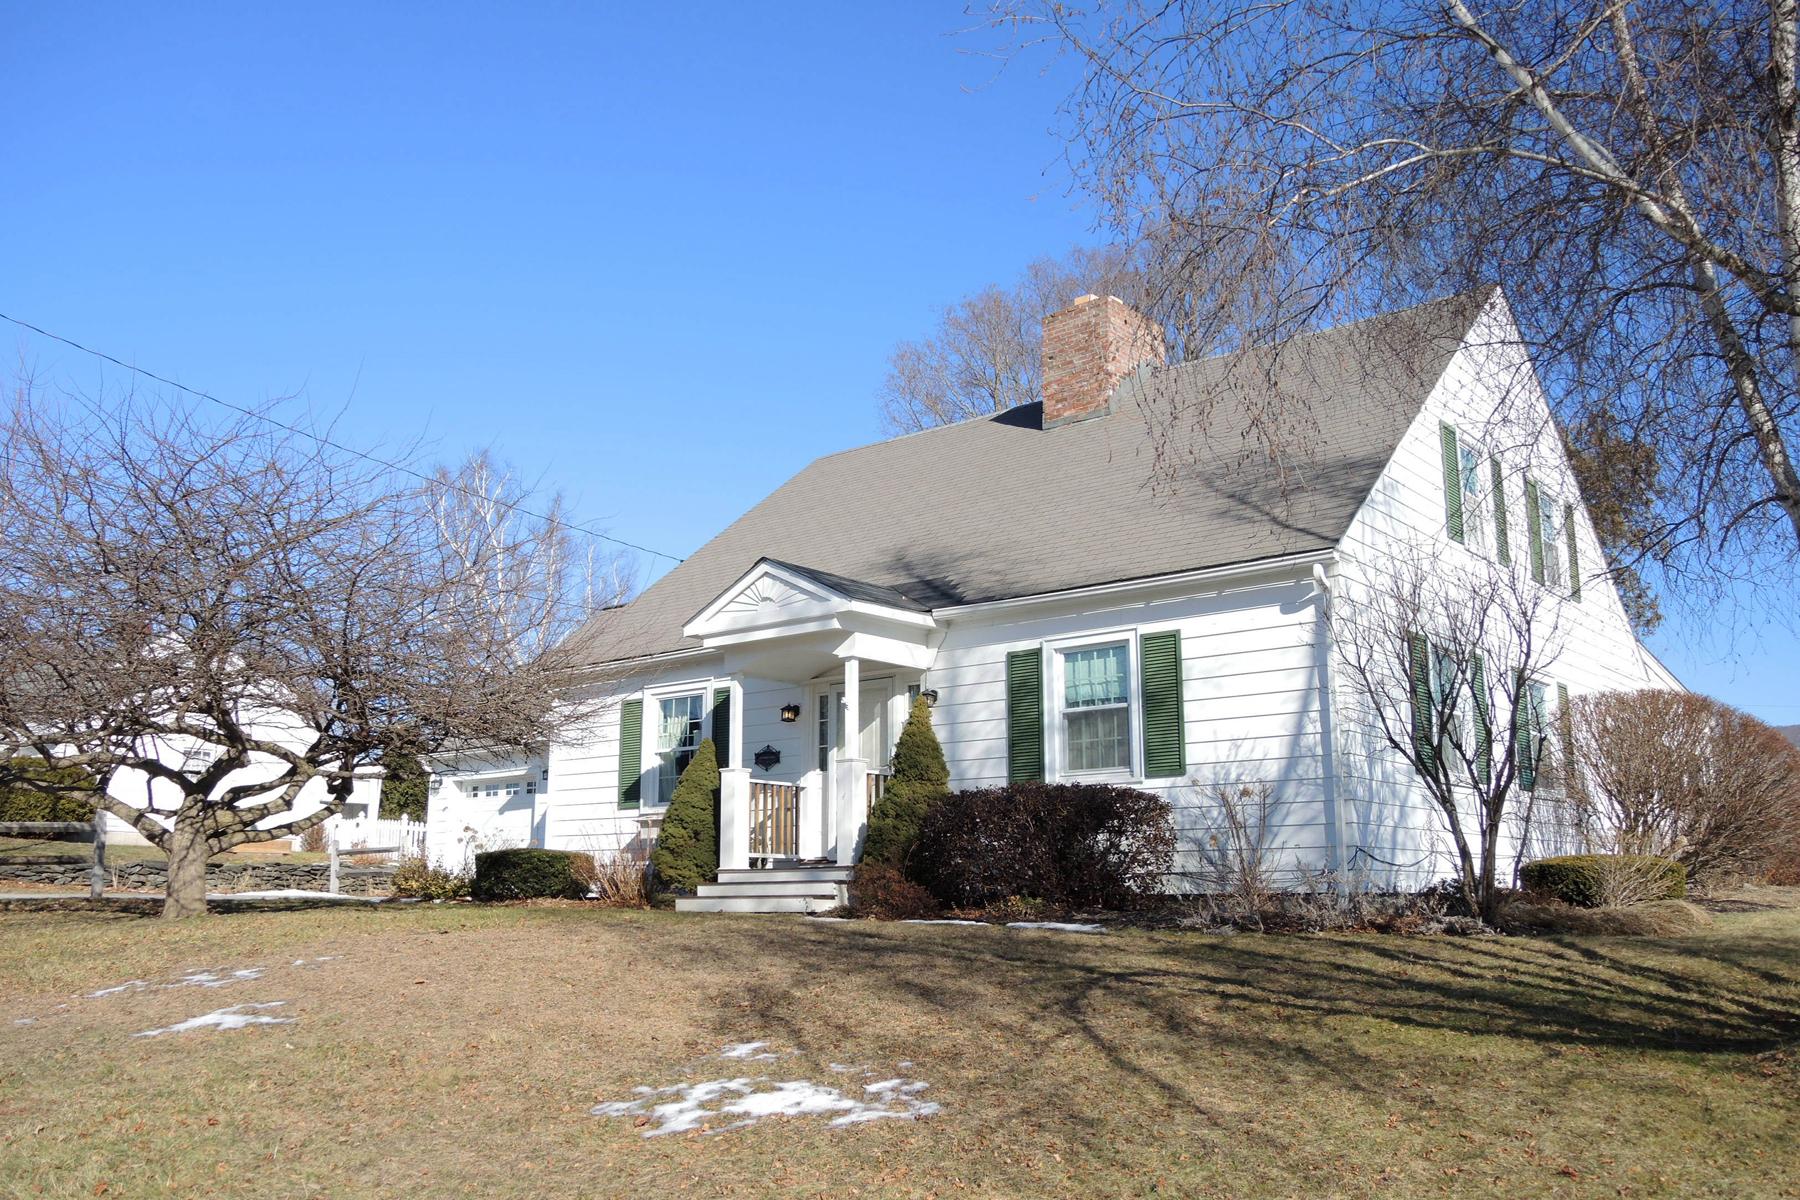 Single Family Homes for Sale at Rutland Cape 12 Harvard St Rutland, Vermont 05701 United States